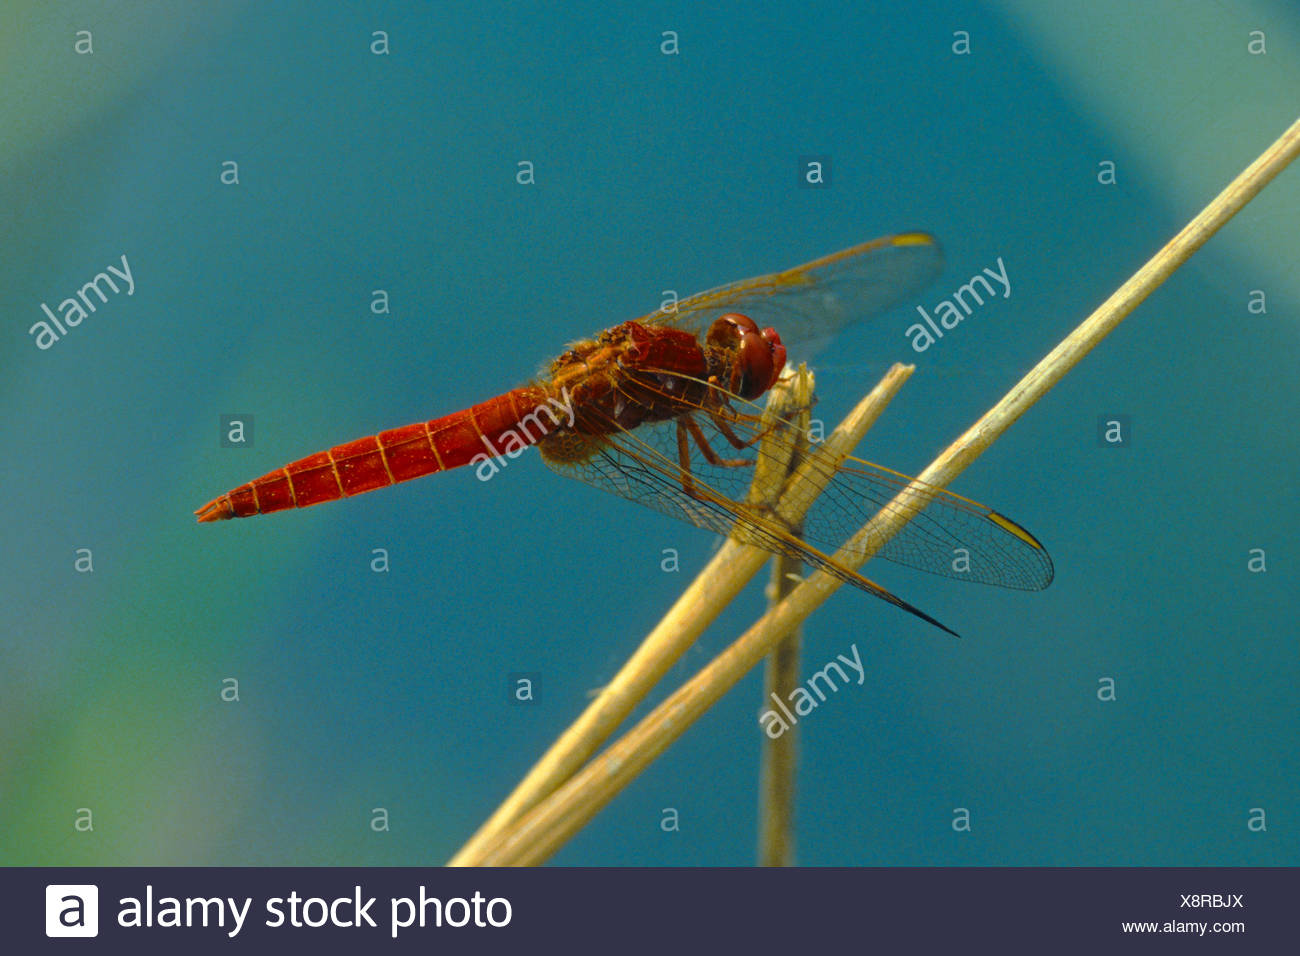 Broad Scarlet, Common Scarlet-darter, Scarlet Darter, Scarlet Dragonfly (Crocothemis erythraea, Croccothemis erythraea), male, Germany Stock Photo